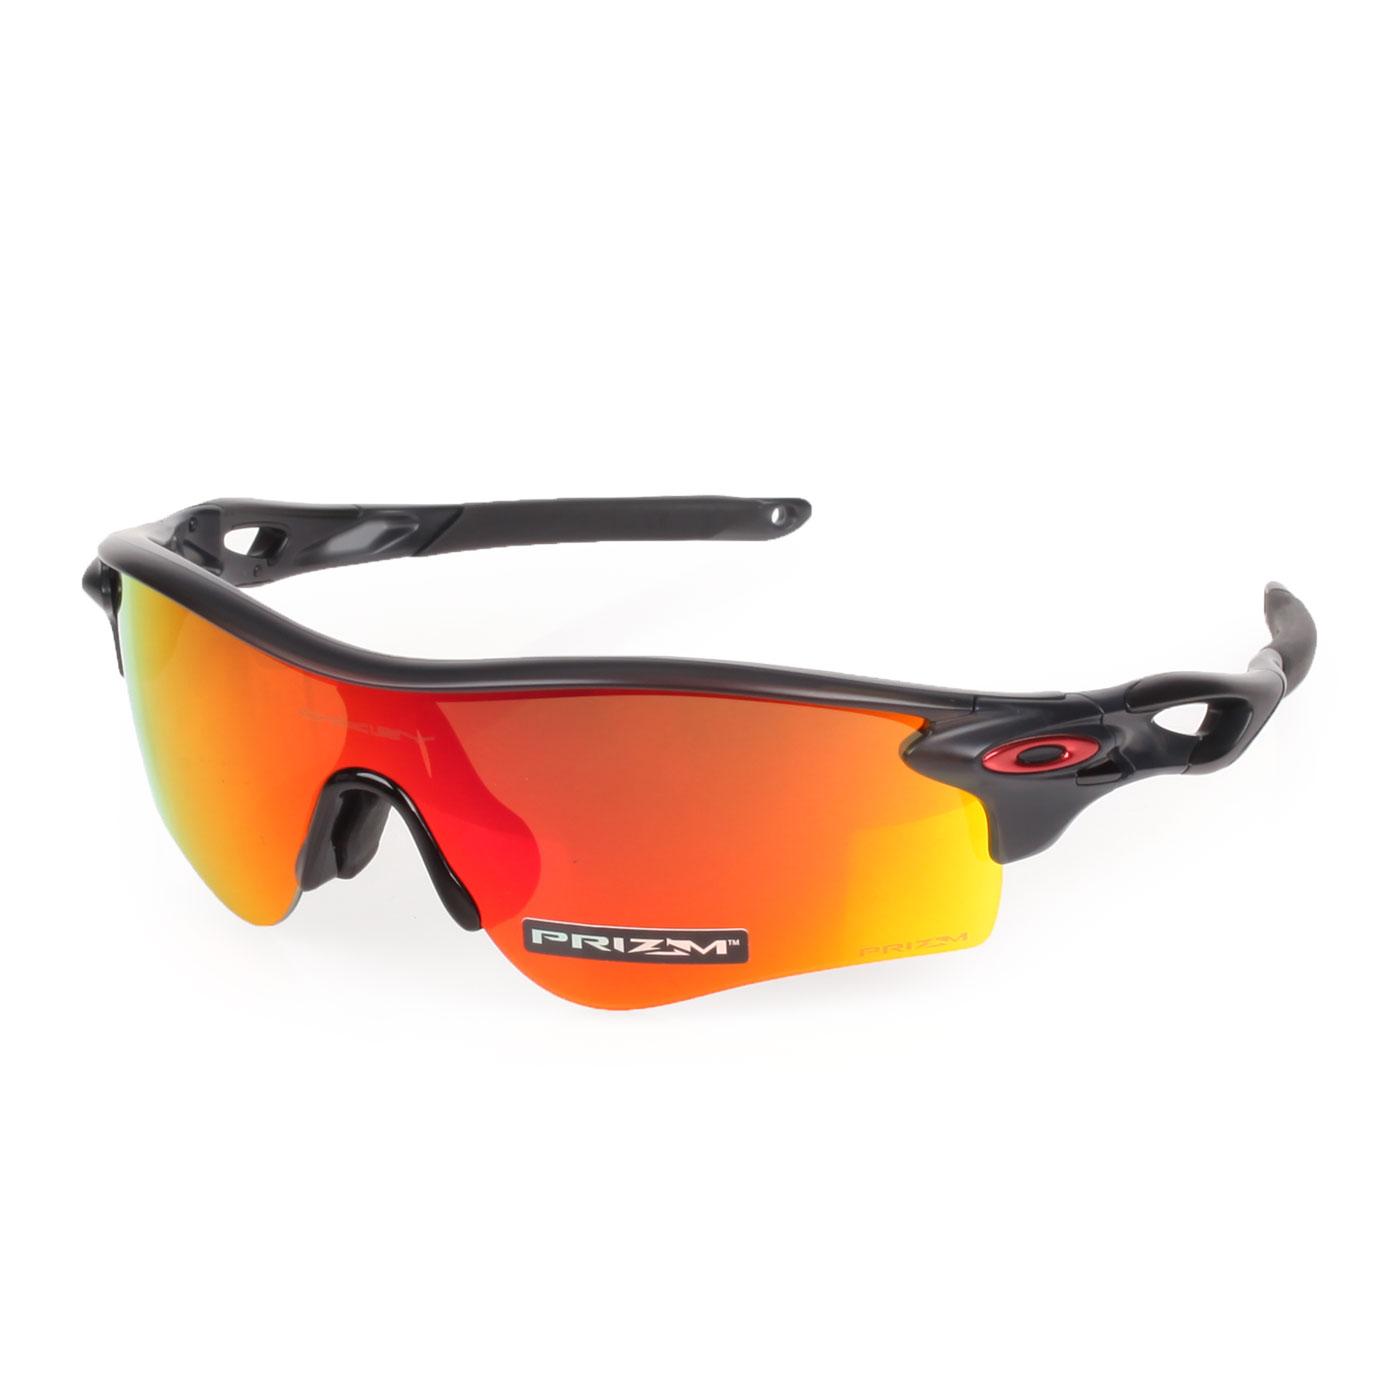 OAKLEY RADARLOCK PATH一般太陽眼鏡(附硬盒鼻墊) OAK-OO9206-4238 - 黑